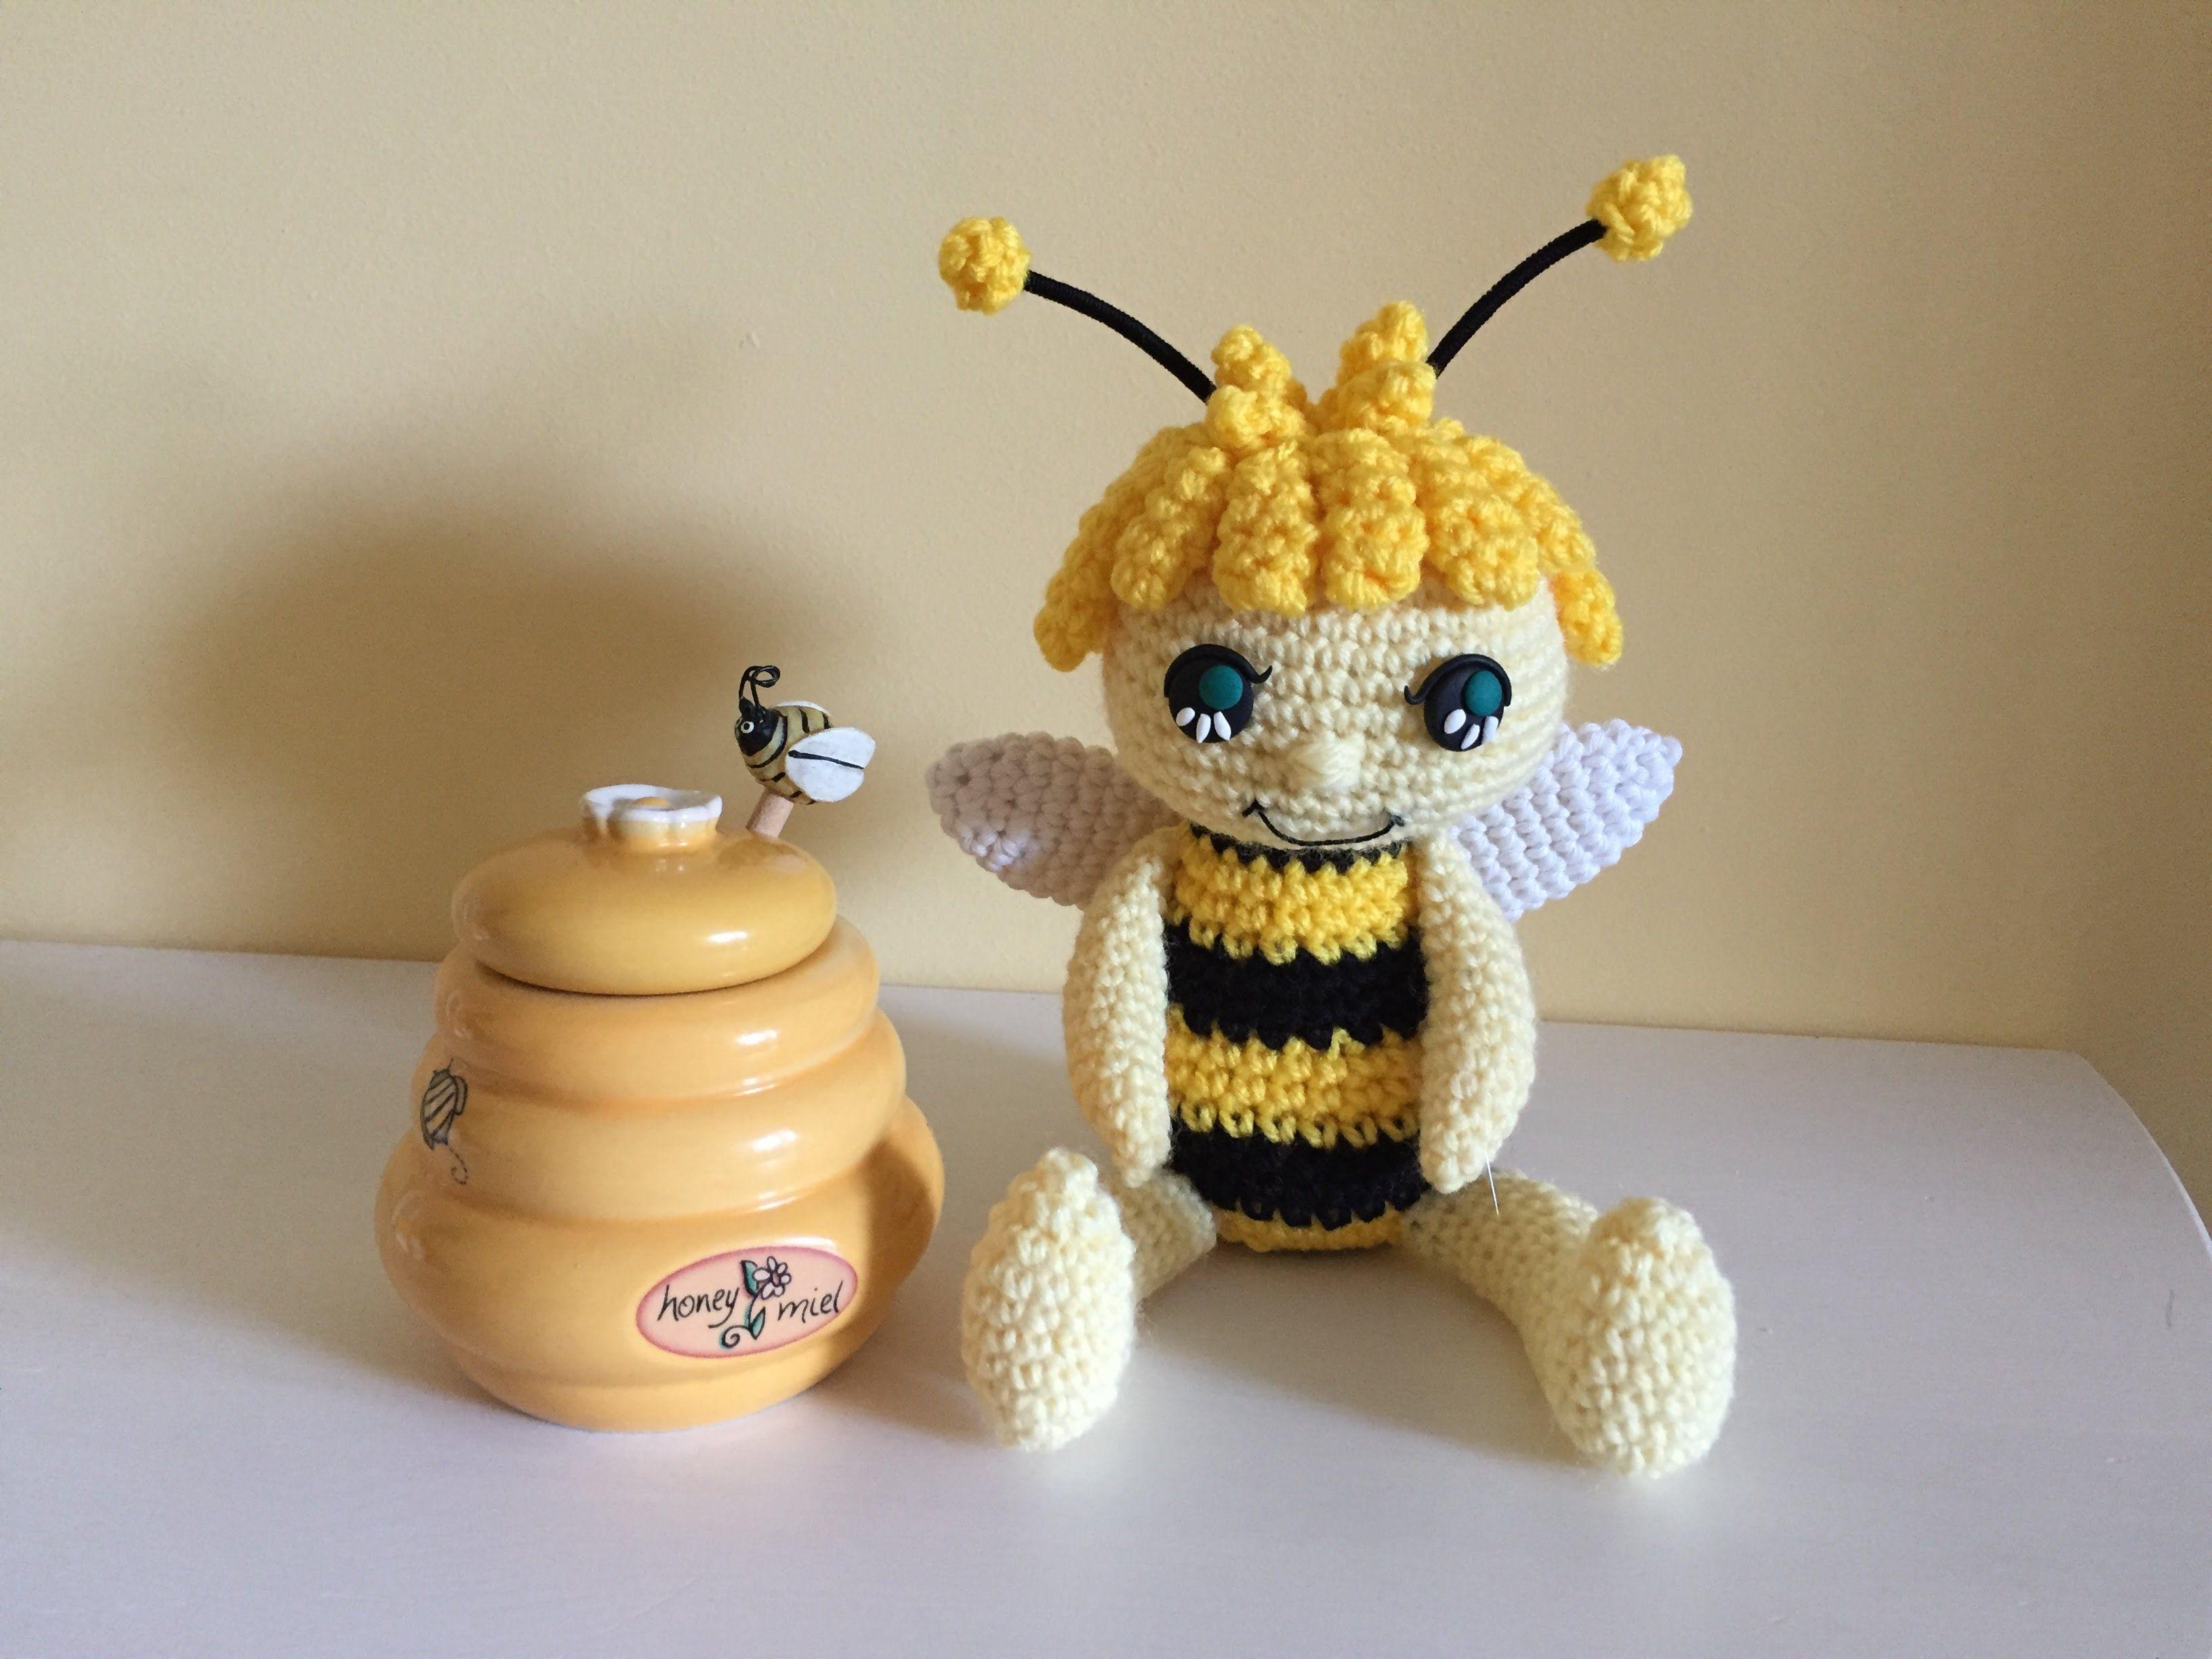 Ape Amigurumi (tutorial)/how to make a bee amigurumi - YouTube ...